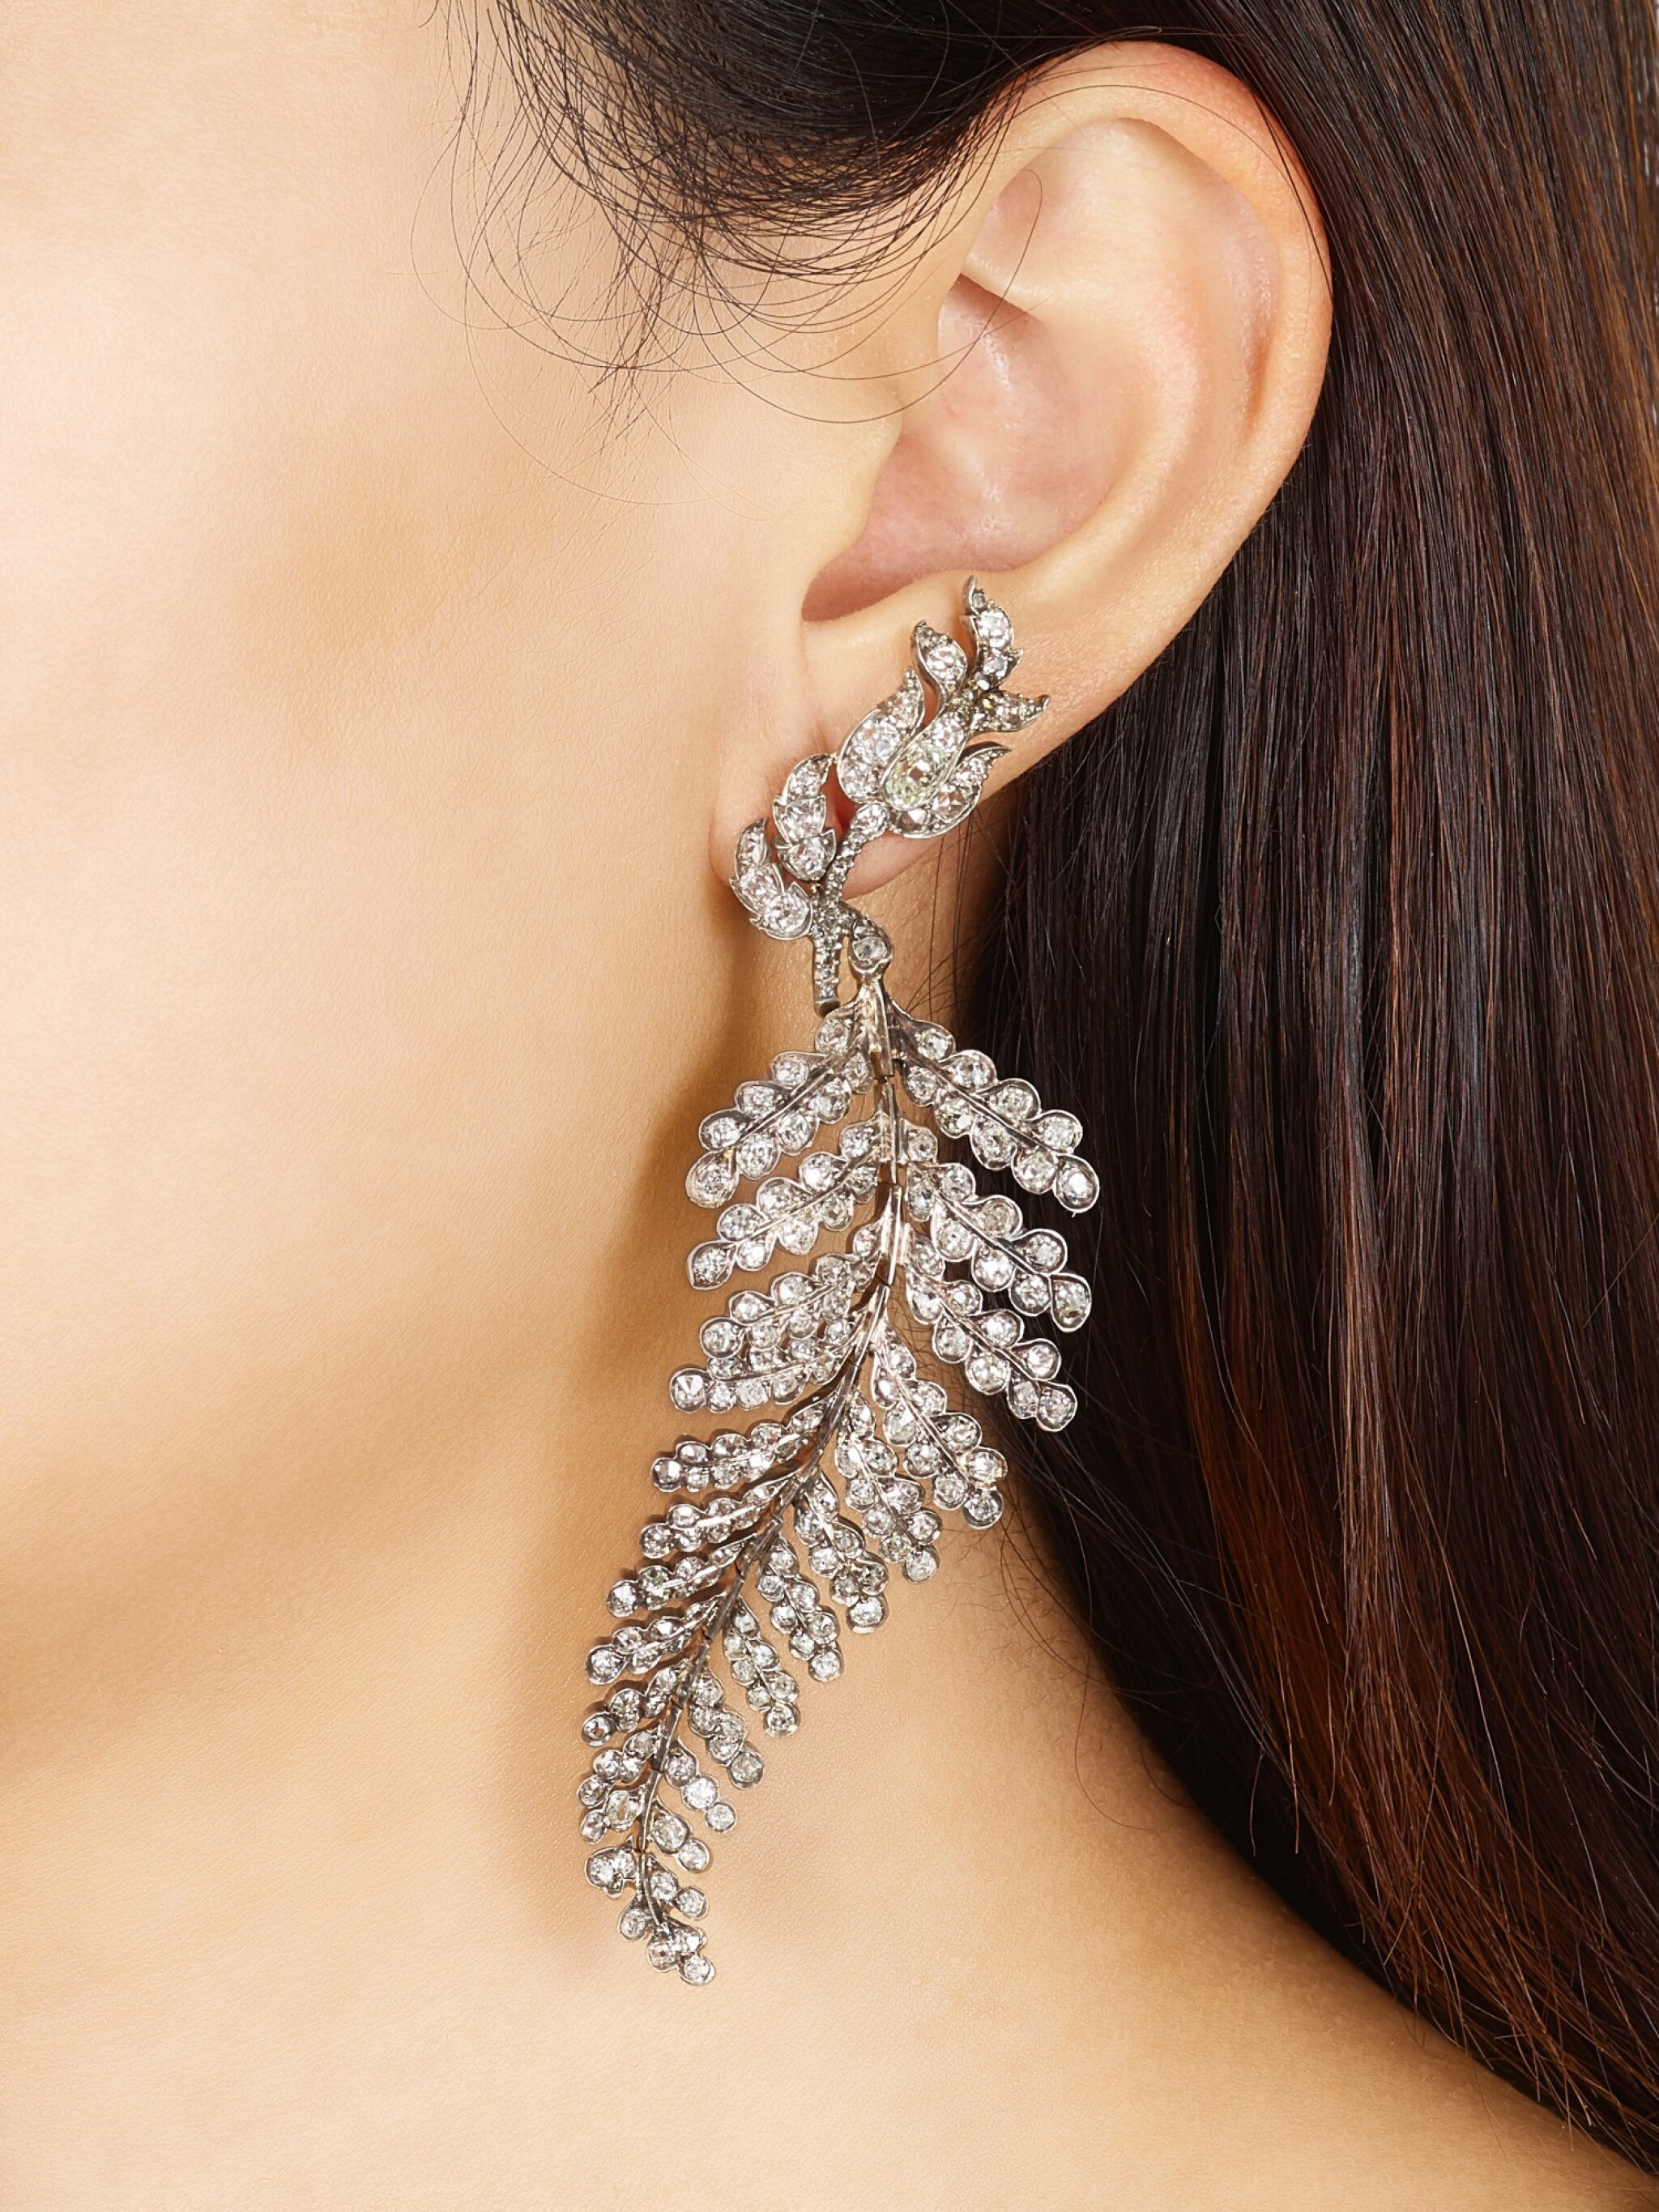 View full screen - View 1 of Lot 1410. ELIANE FATTAL   'FERN' PAIR OF DIAMOND EARRINGS   Eliane Fattal   'Fern' 鑽石耳環一對.